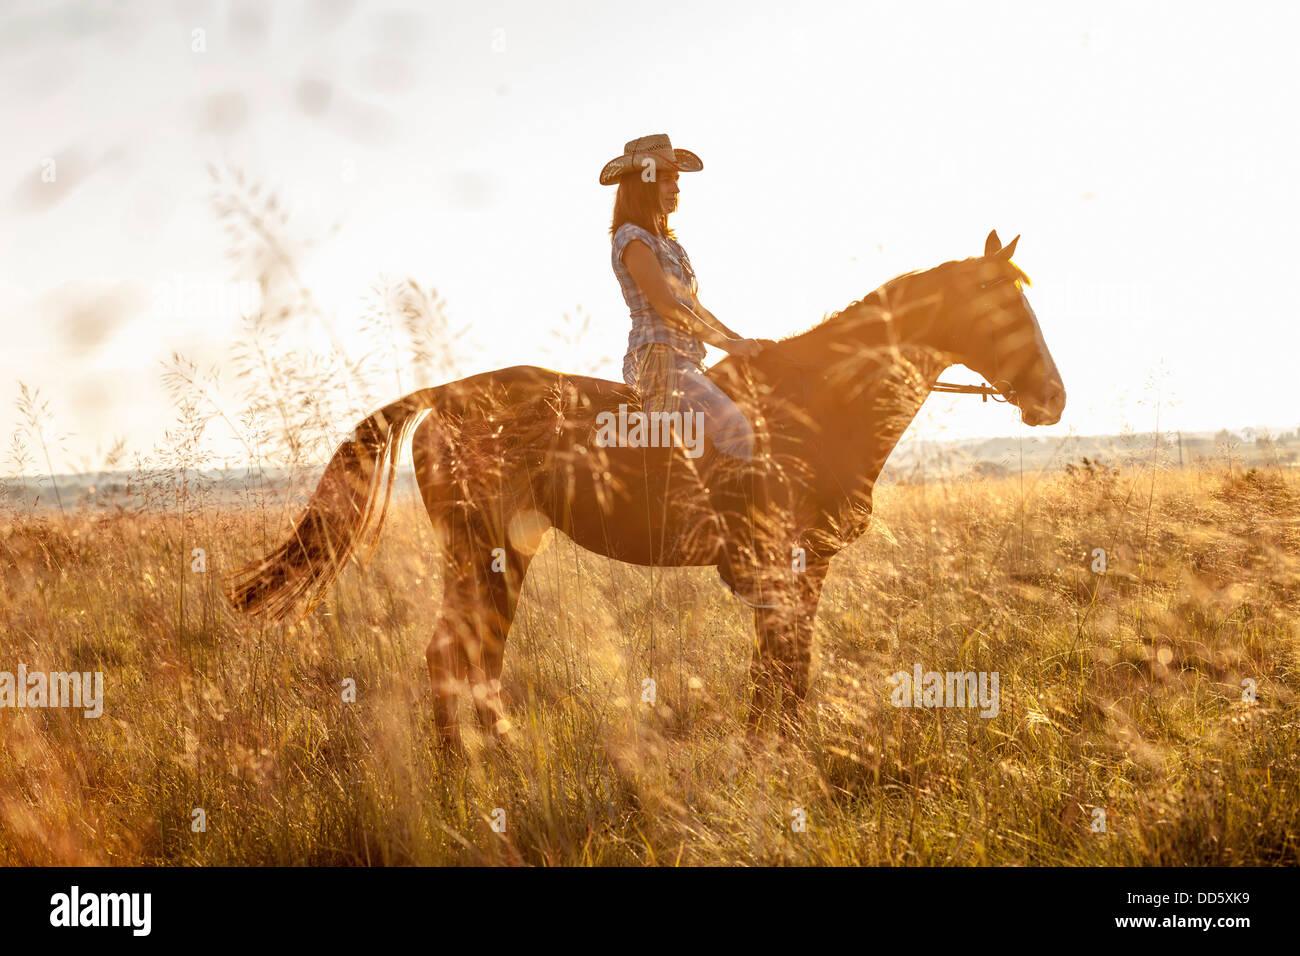 Croacia, Dalmacia, joven cabalgatas Foto de stock